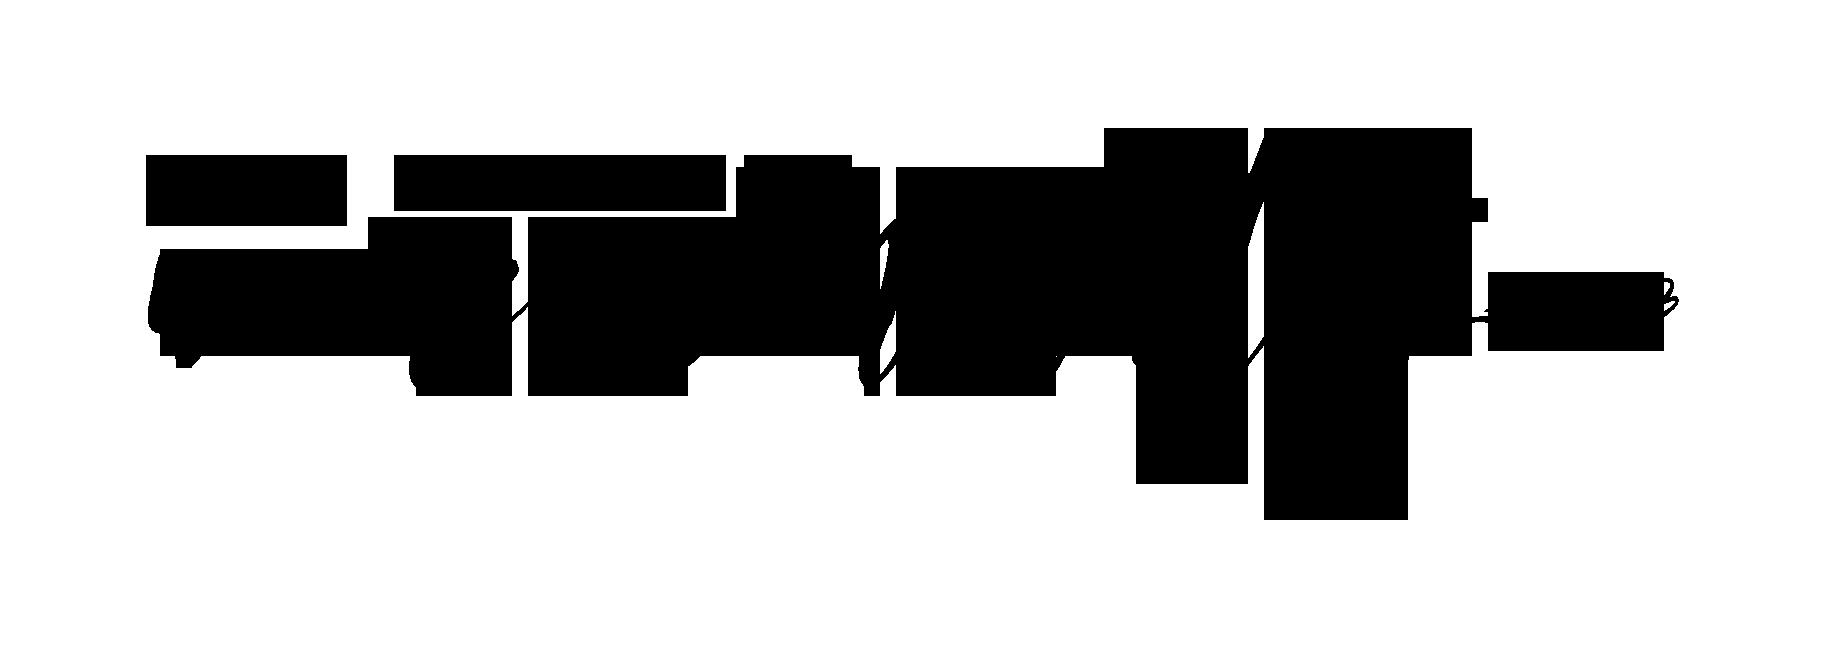 wm-logo-black.png